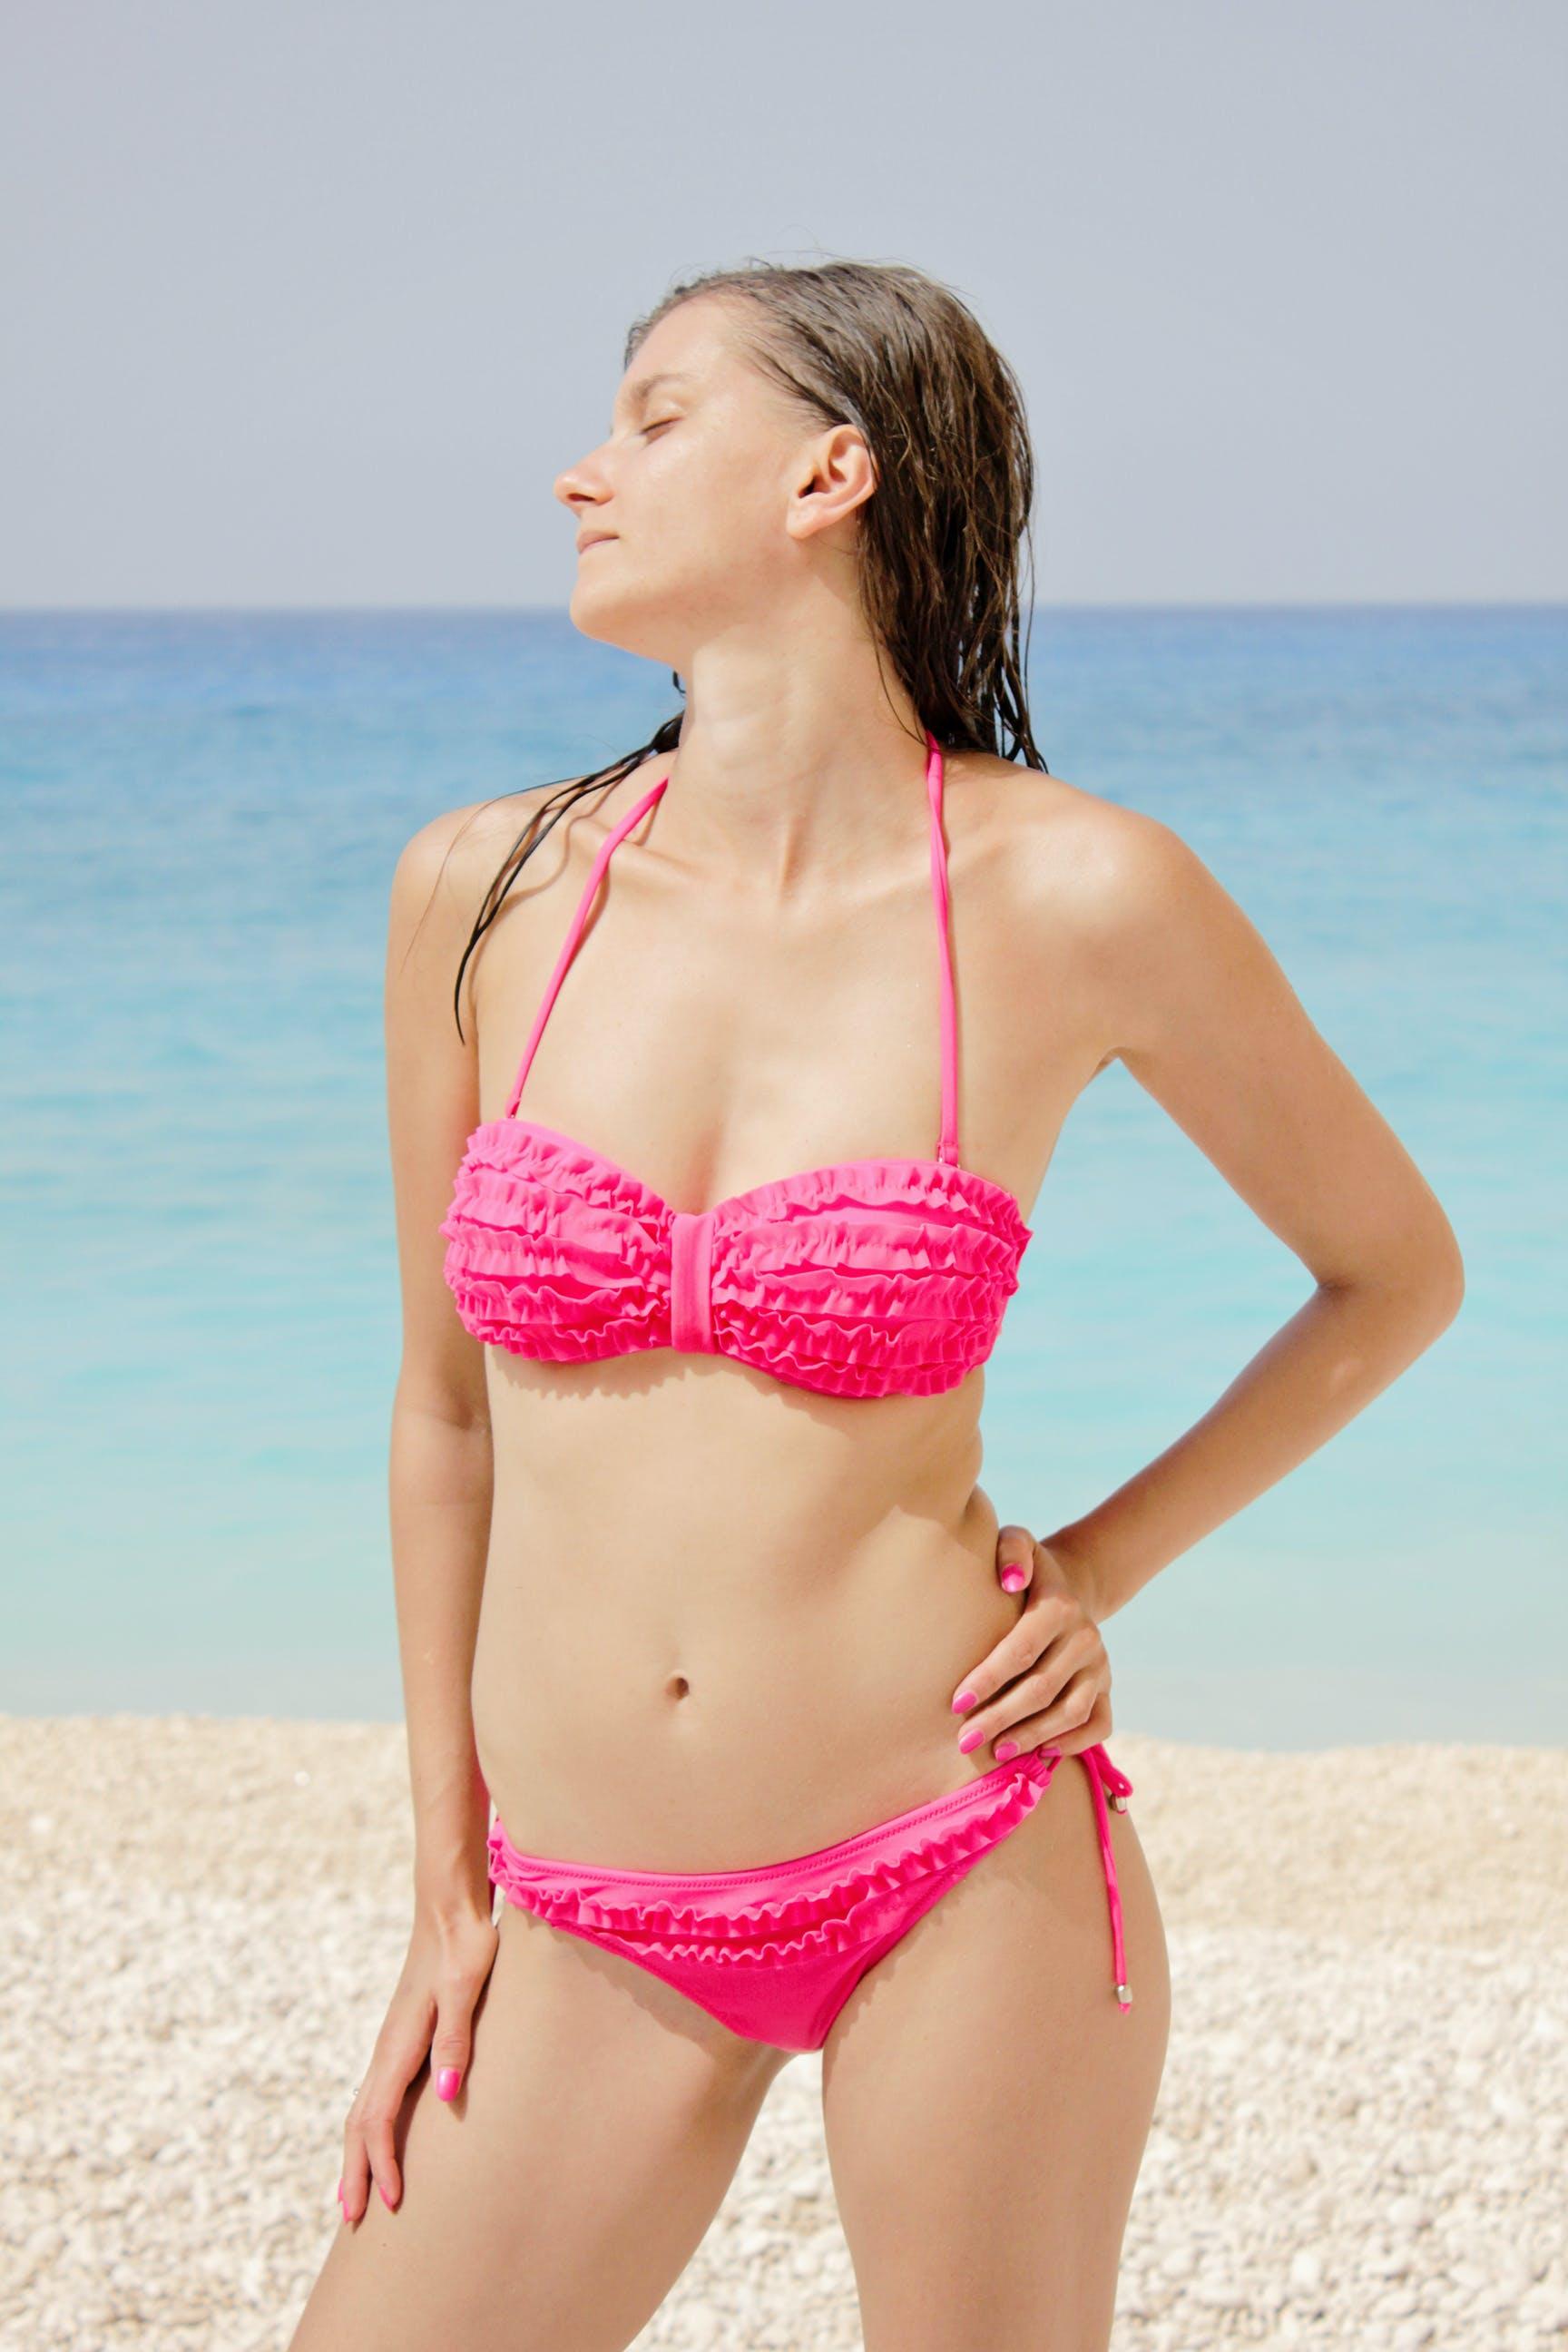 Kostenloses Stock Foto zu badeanzug, bikini, entspannung, erholung